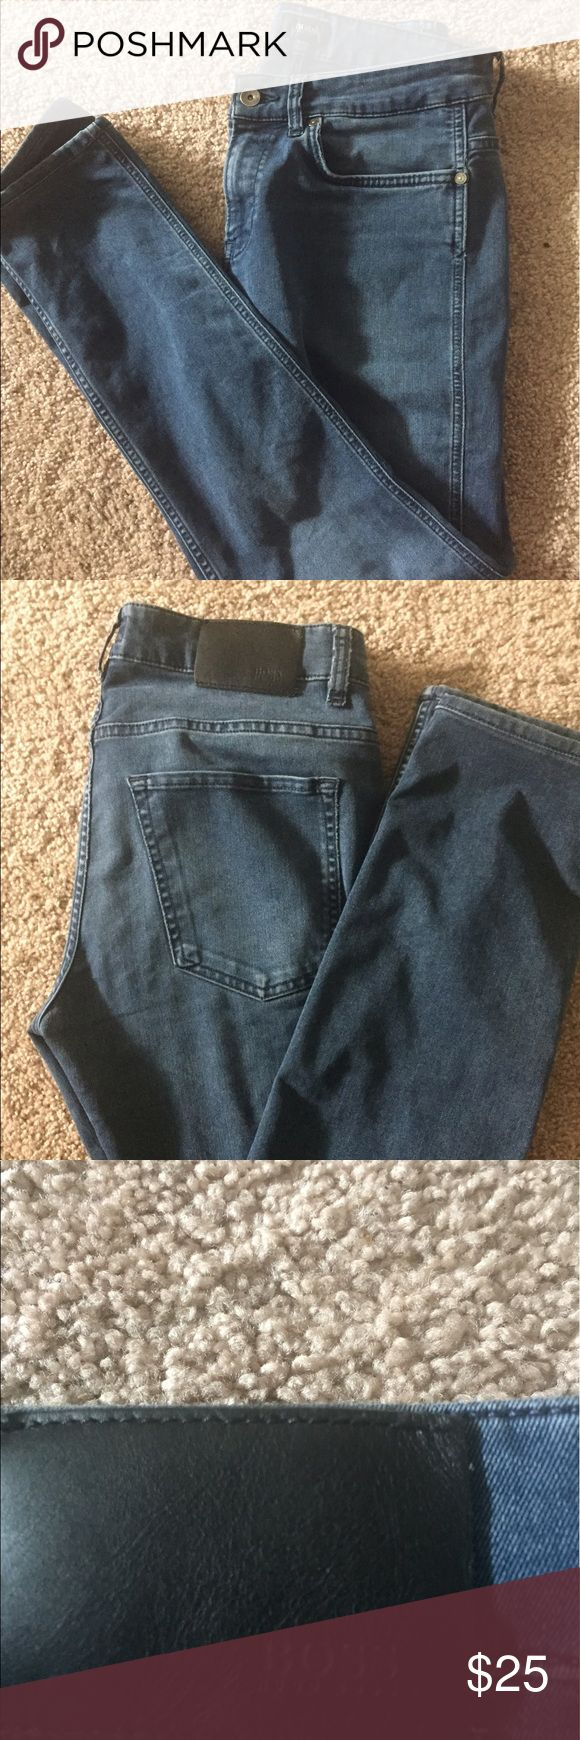 Hugo boss skinny jeans Super cute Hugo boss skinny jeans GENTLY USED GREAT CONDITION Hugo Boss Jeans Skinny